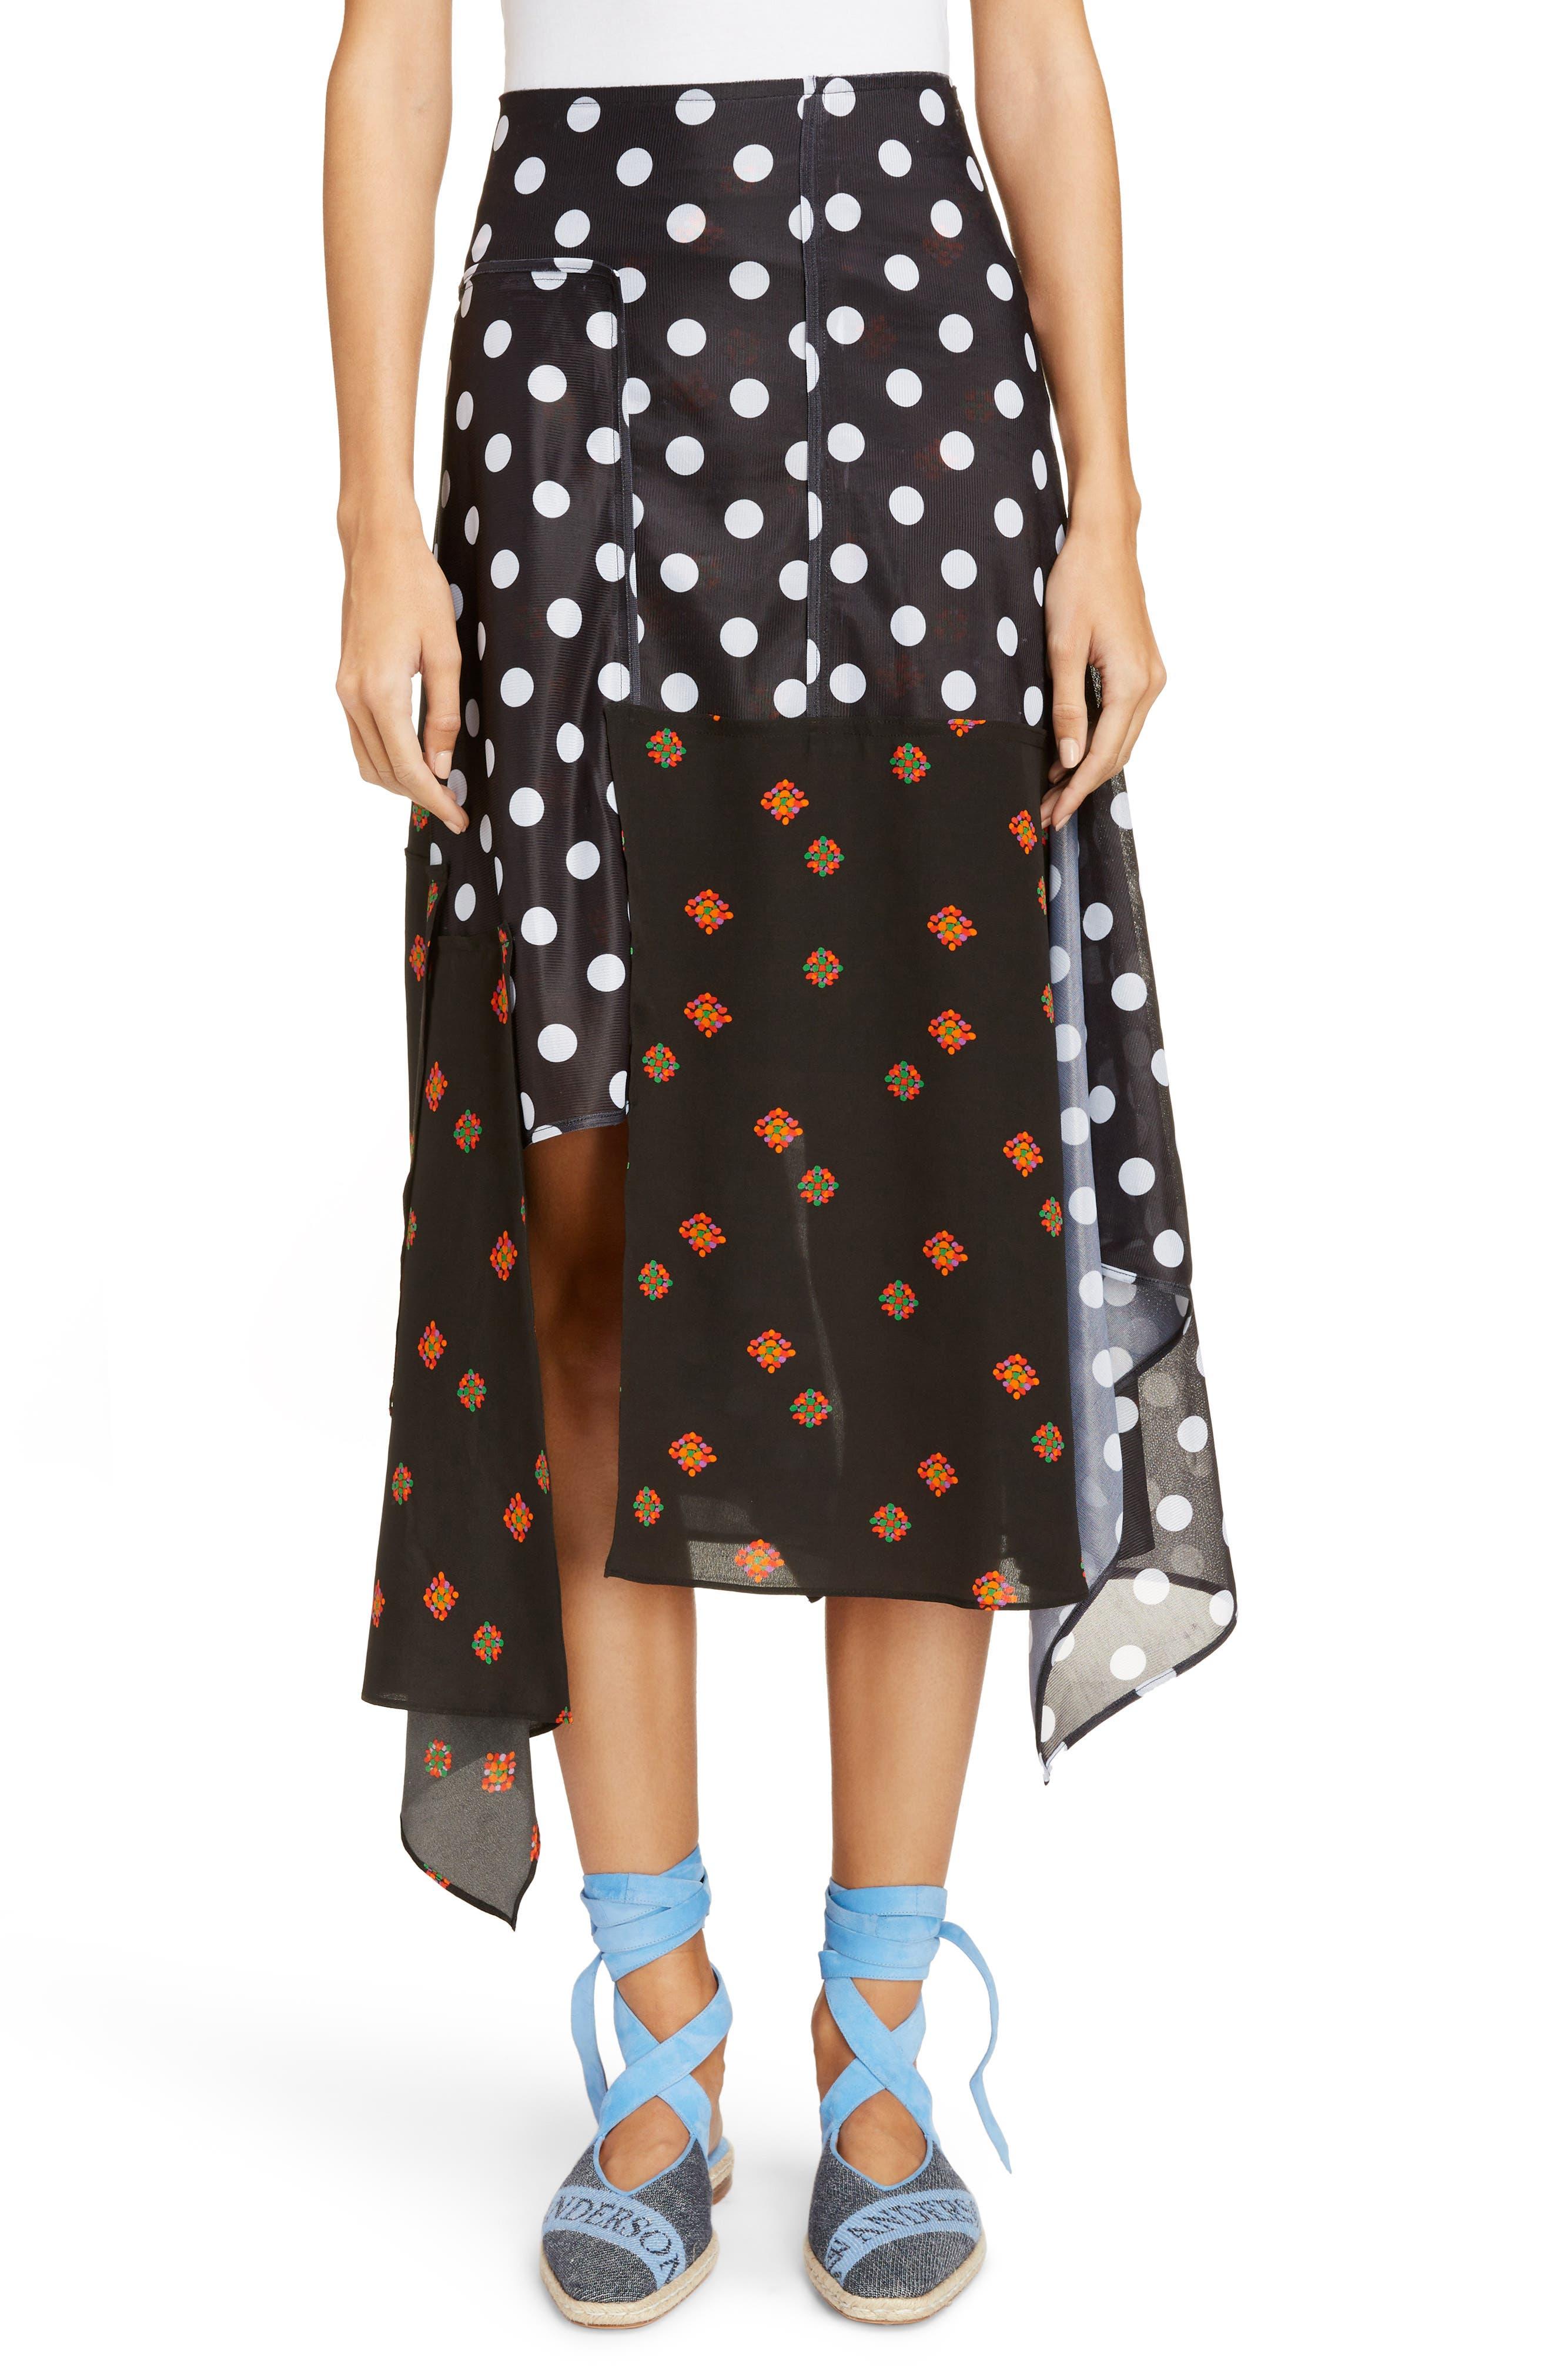 J.W.ANDERSON Polka Dot & Floral Panel Skirt